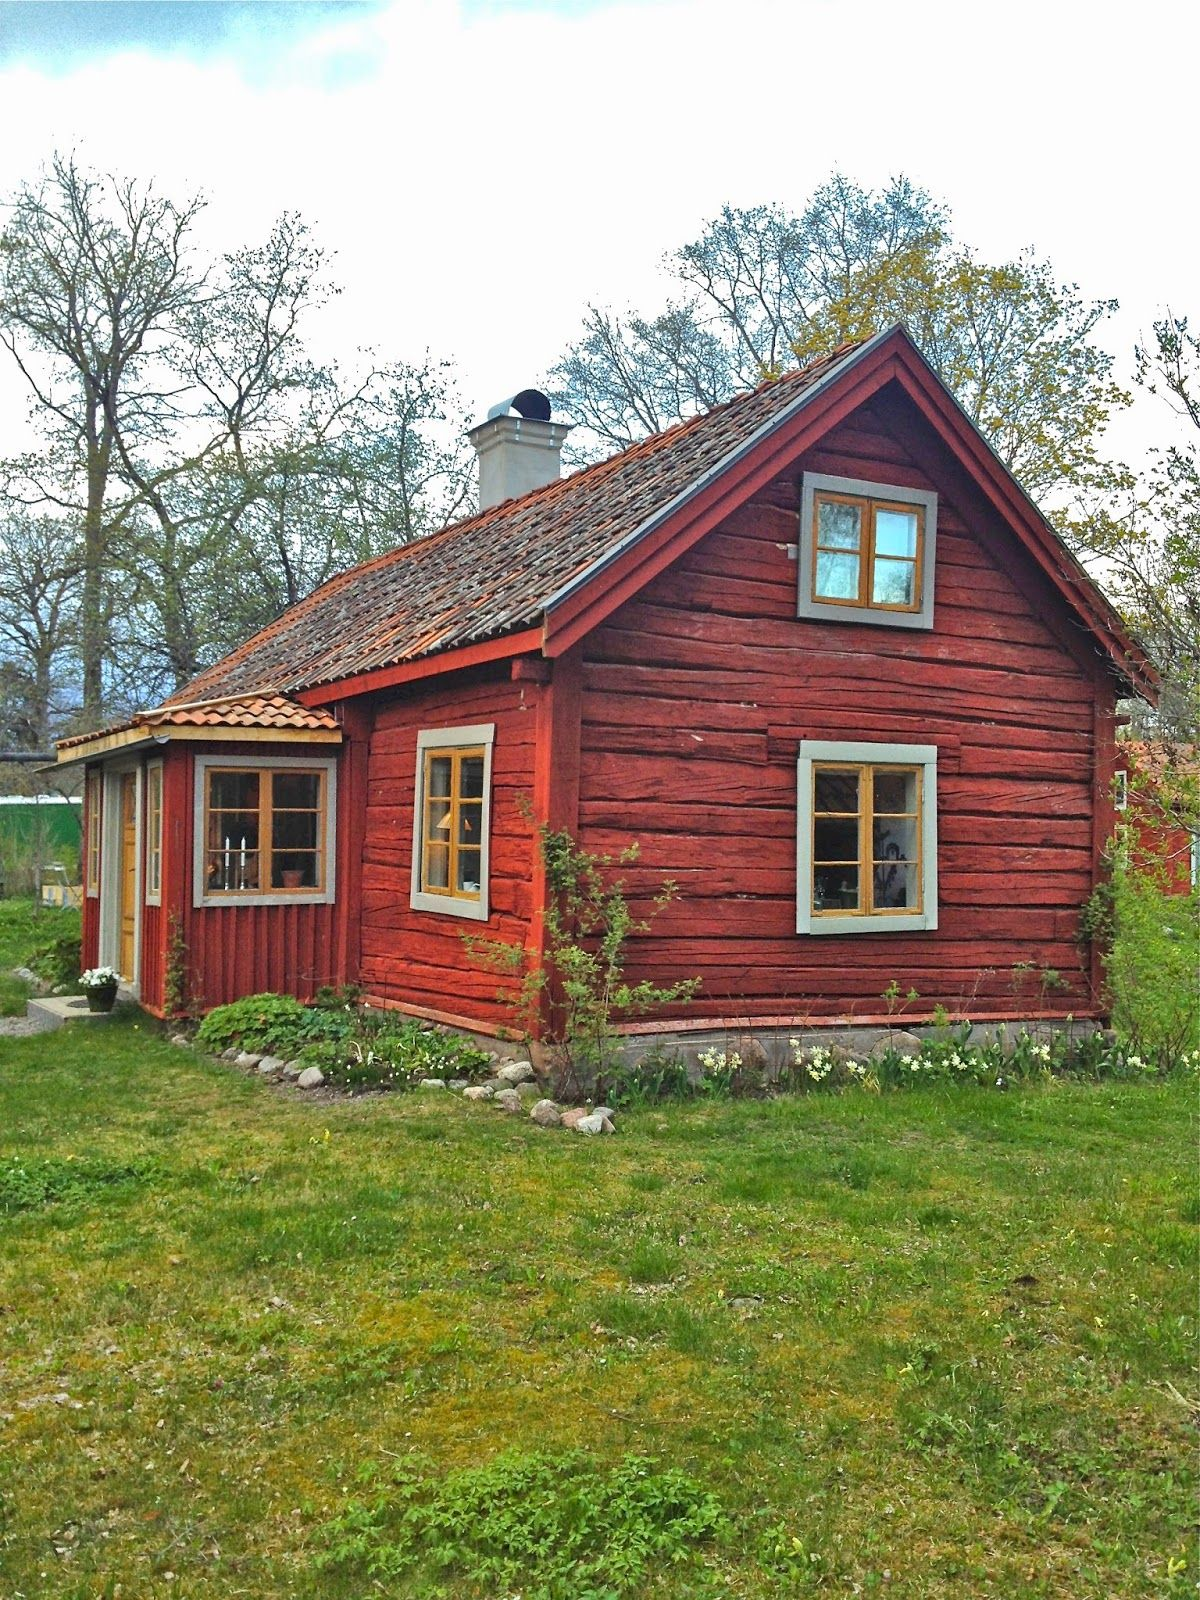 Elins stuga valborgsfirande med bror och sv gerska for Med cottages